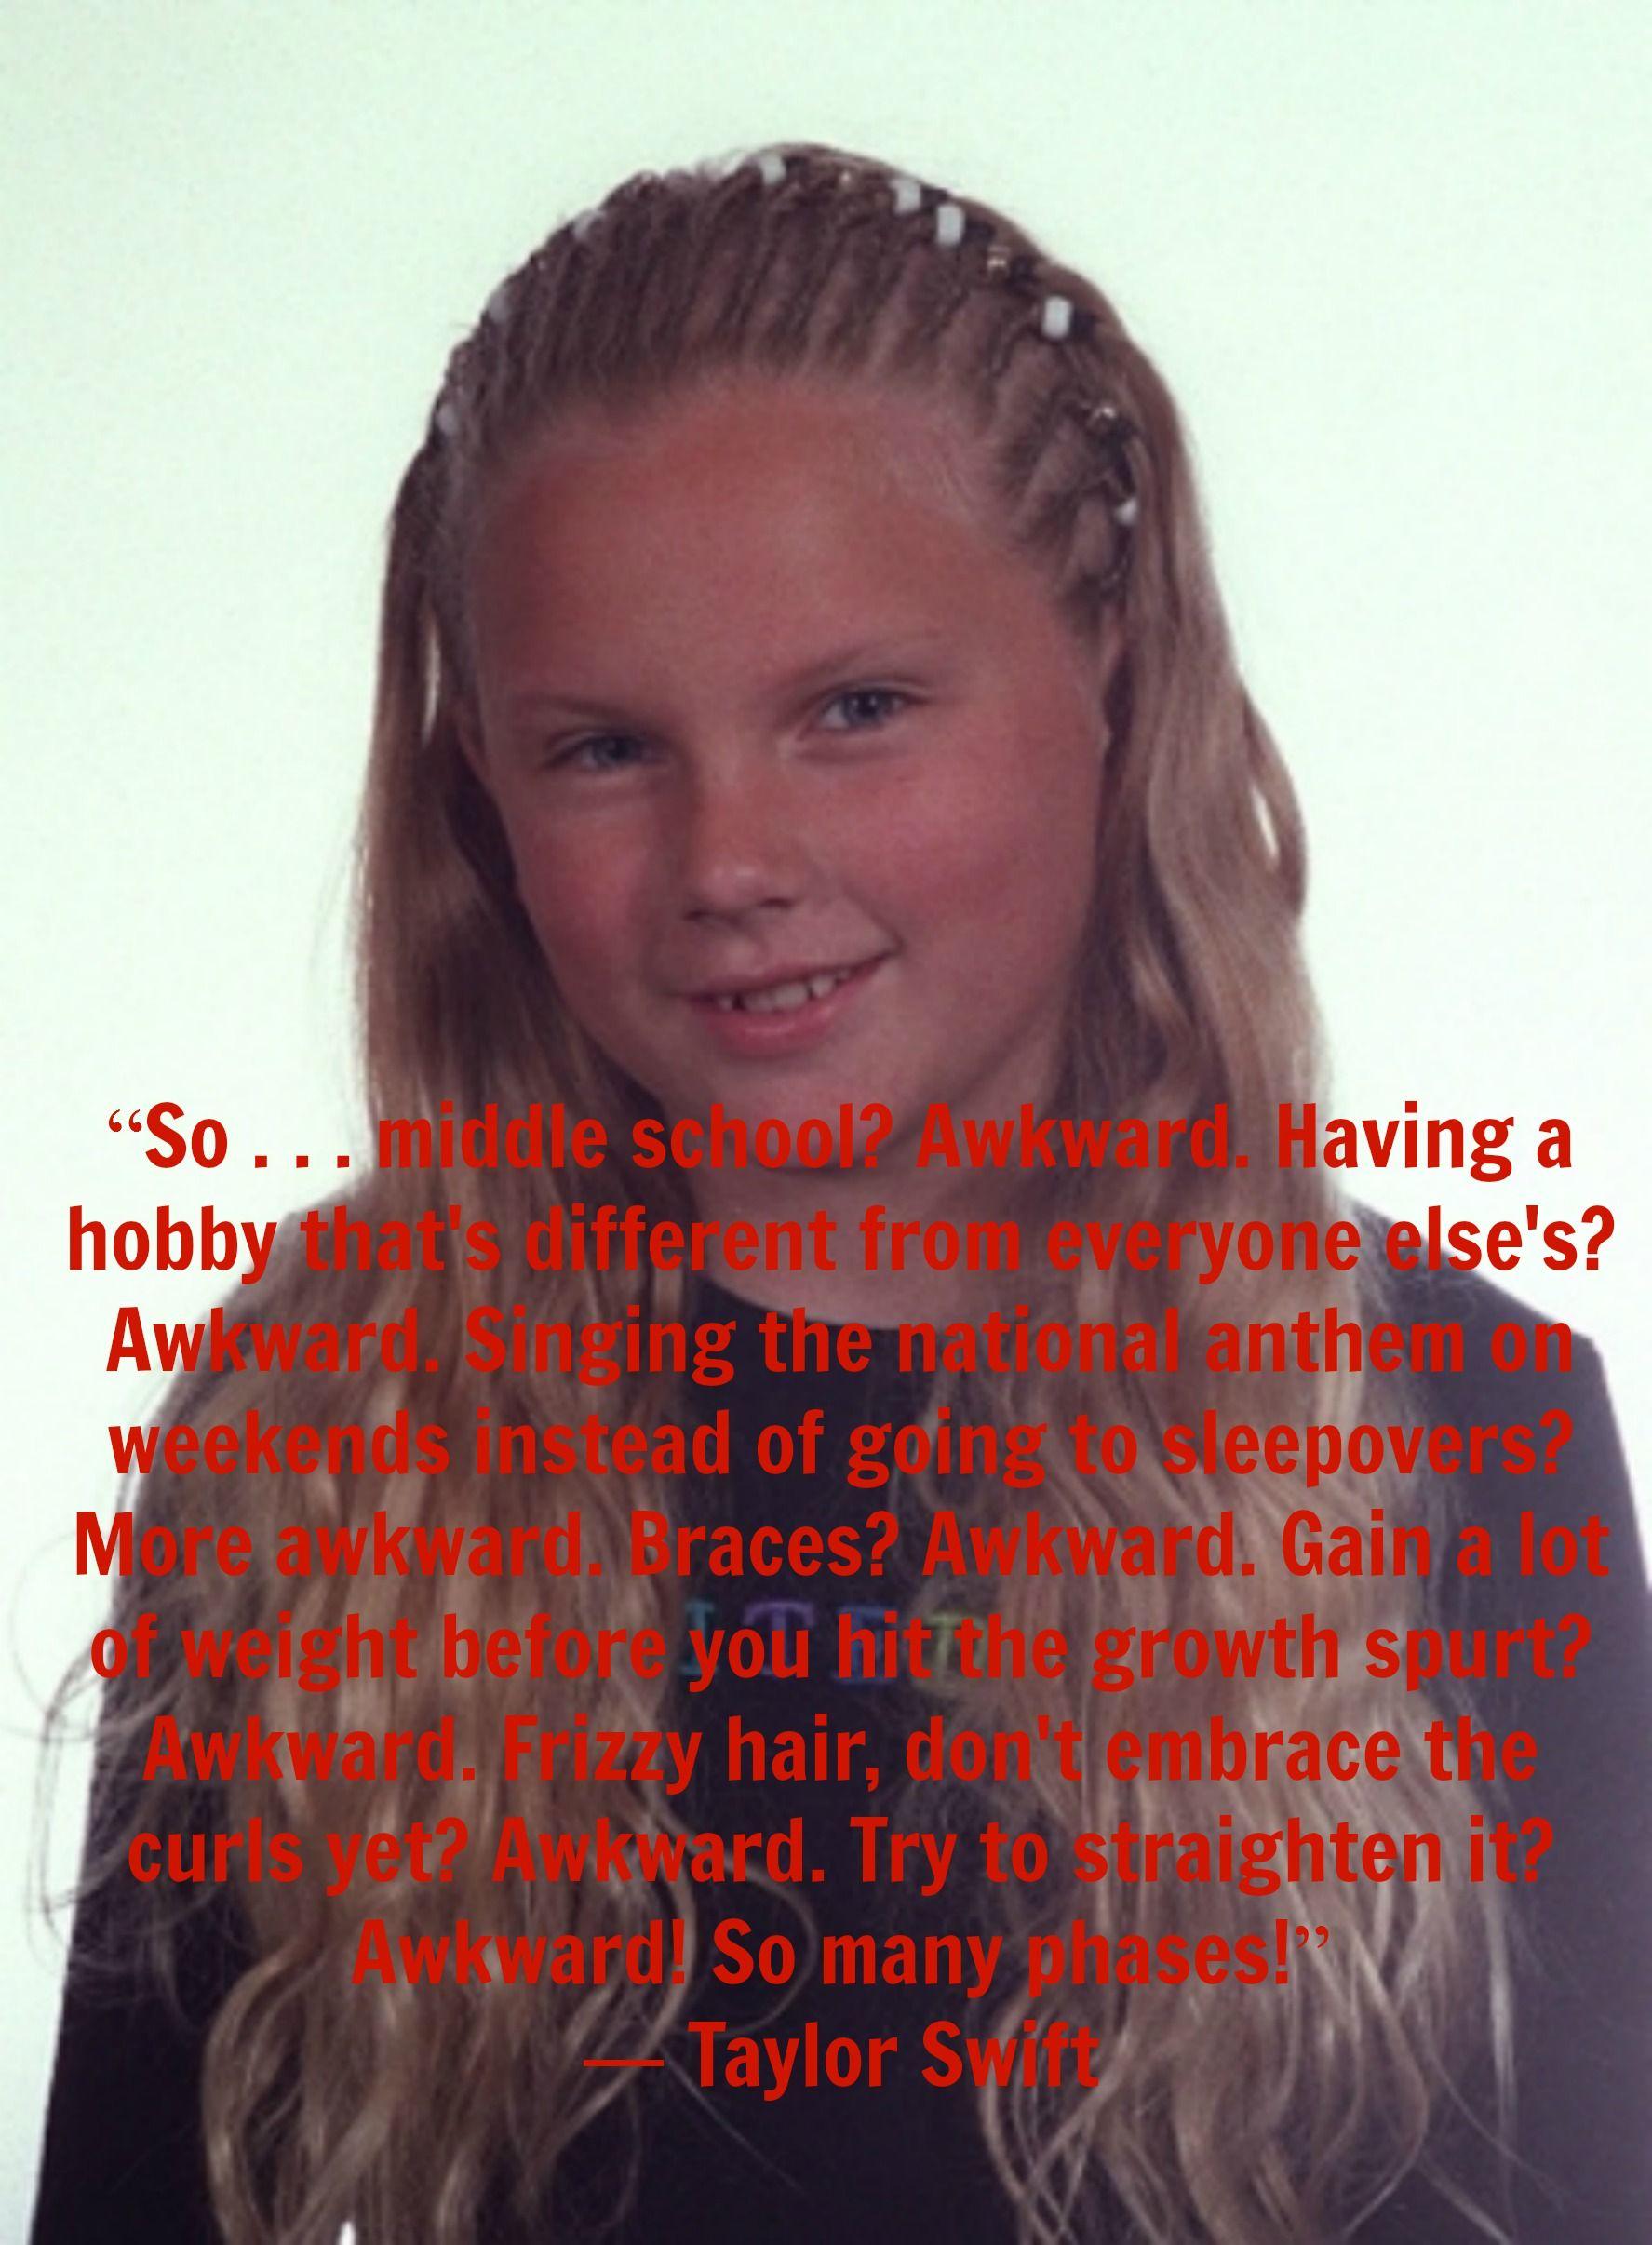 Taylor Swift Awkward Awkward Frizzy Hair Everyone Else